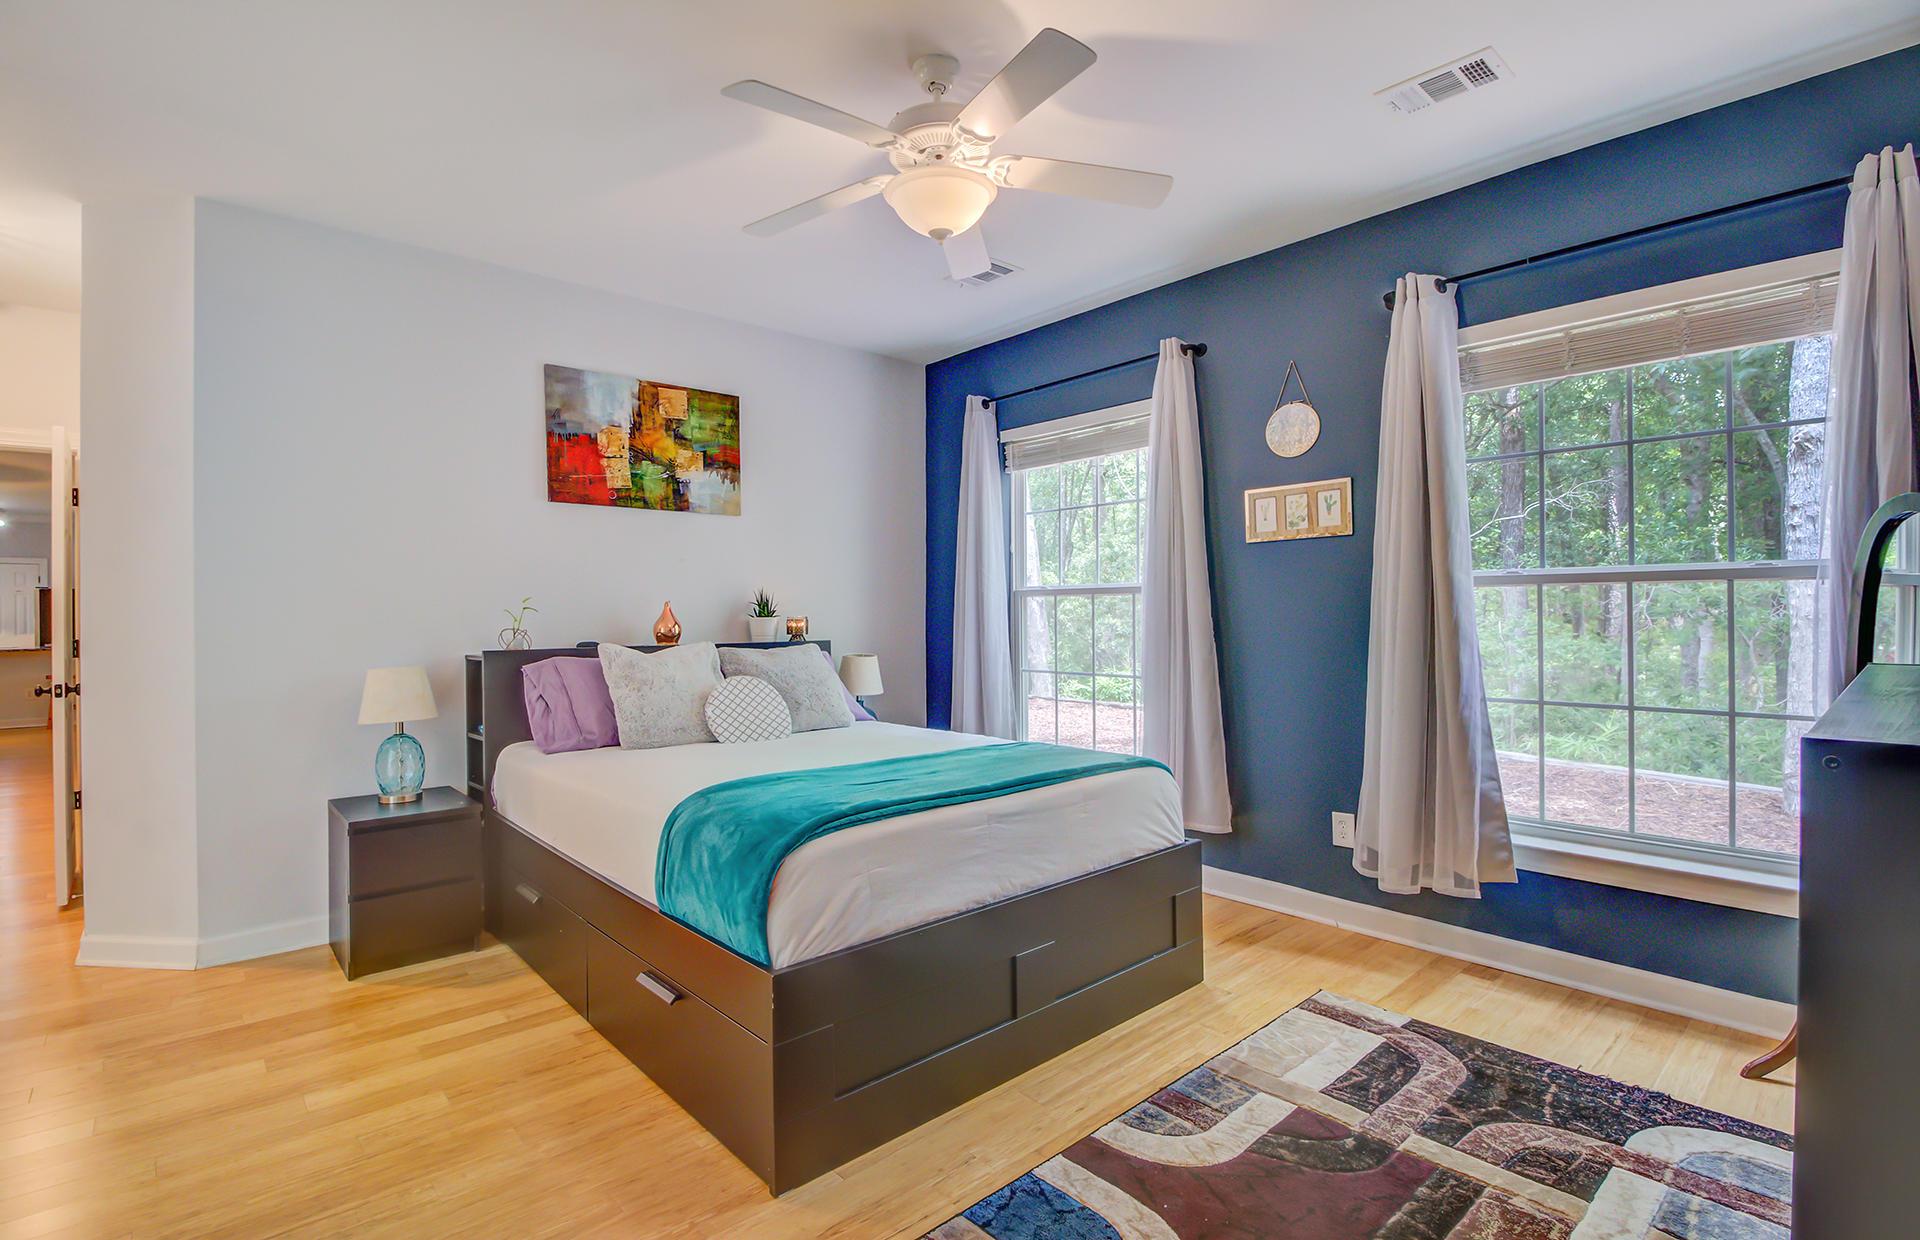 Dunes West Homes For Sale - 1566 Oxborough, Mount Pleasant, SC - 17